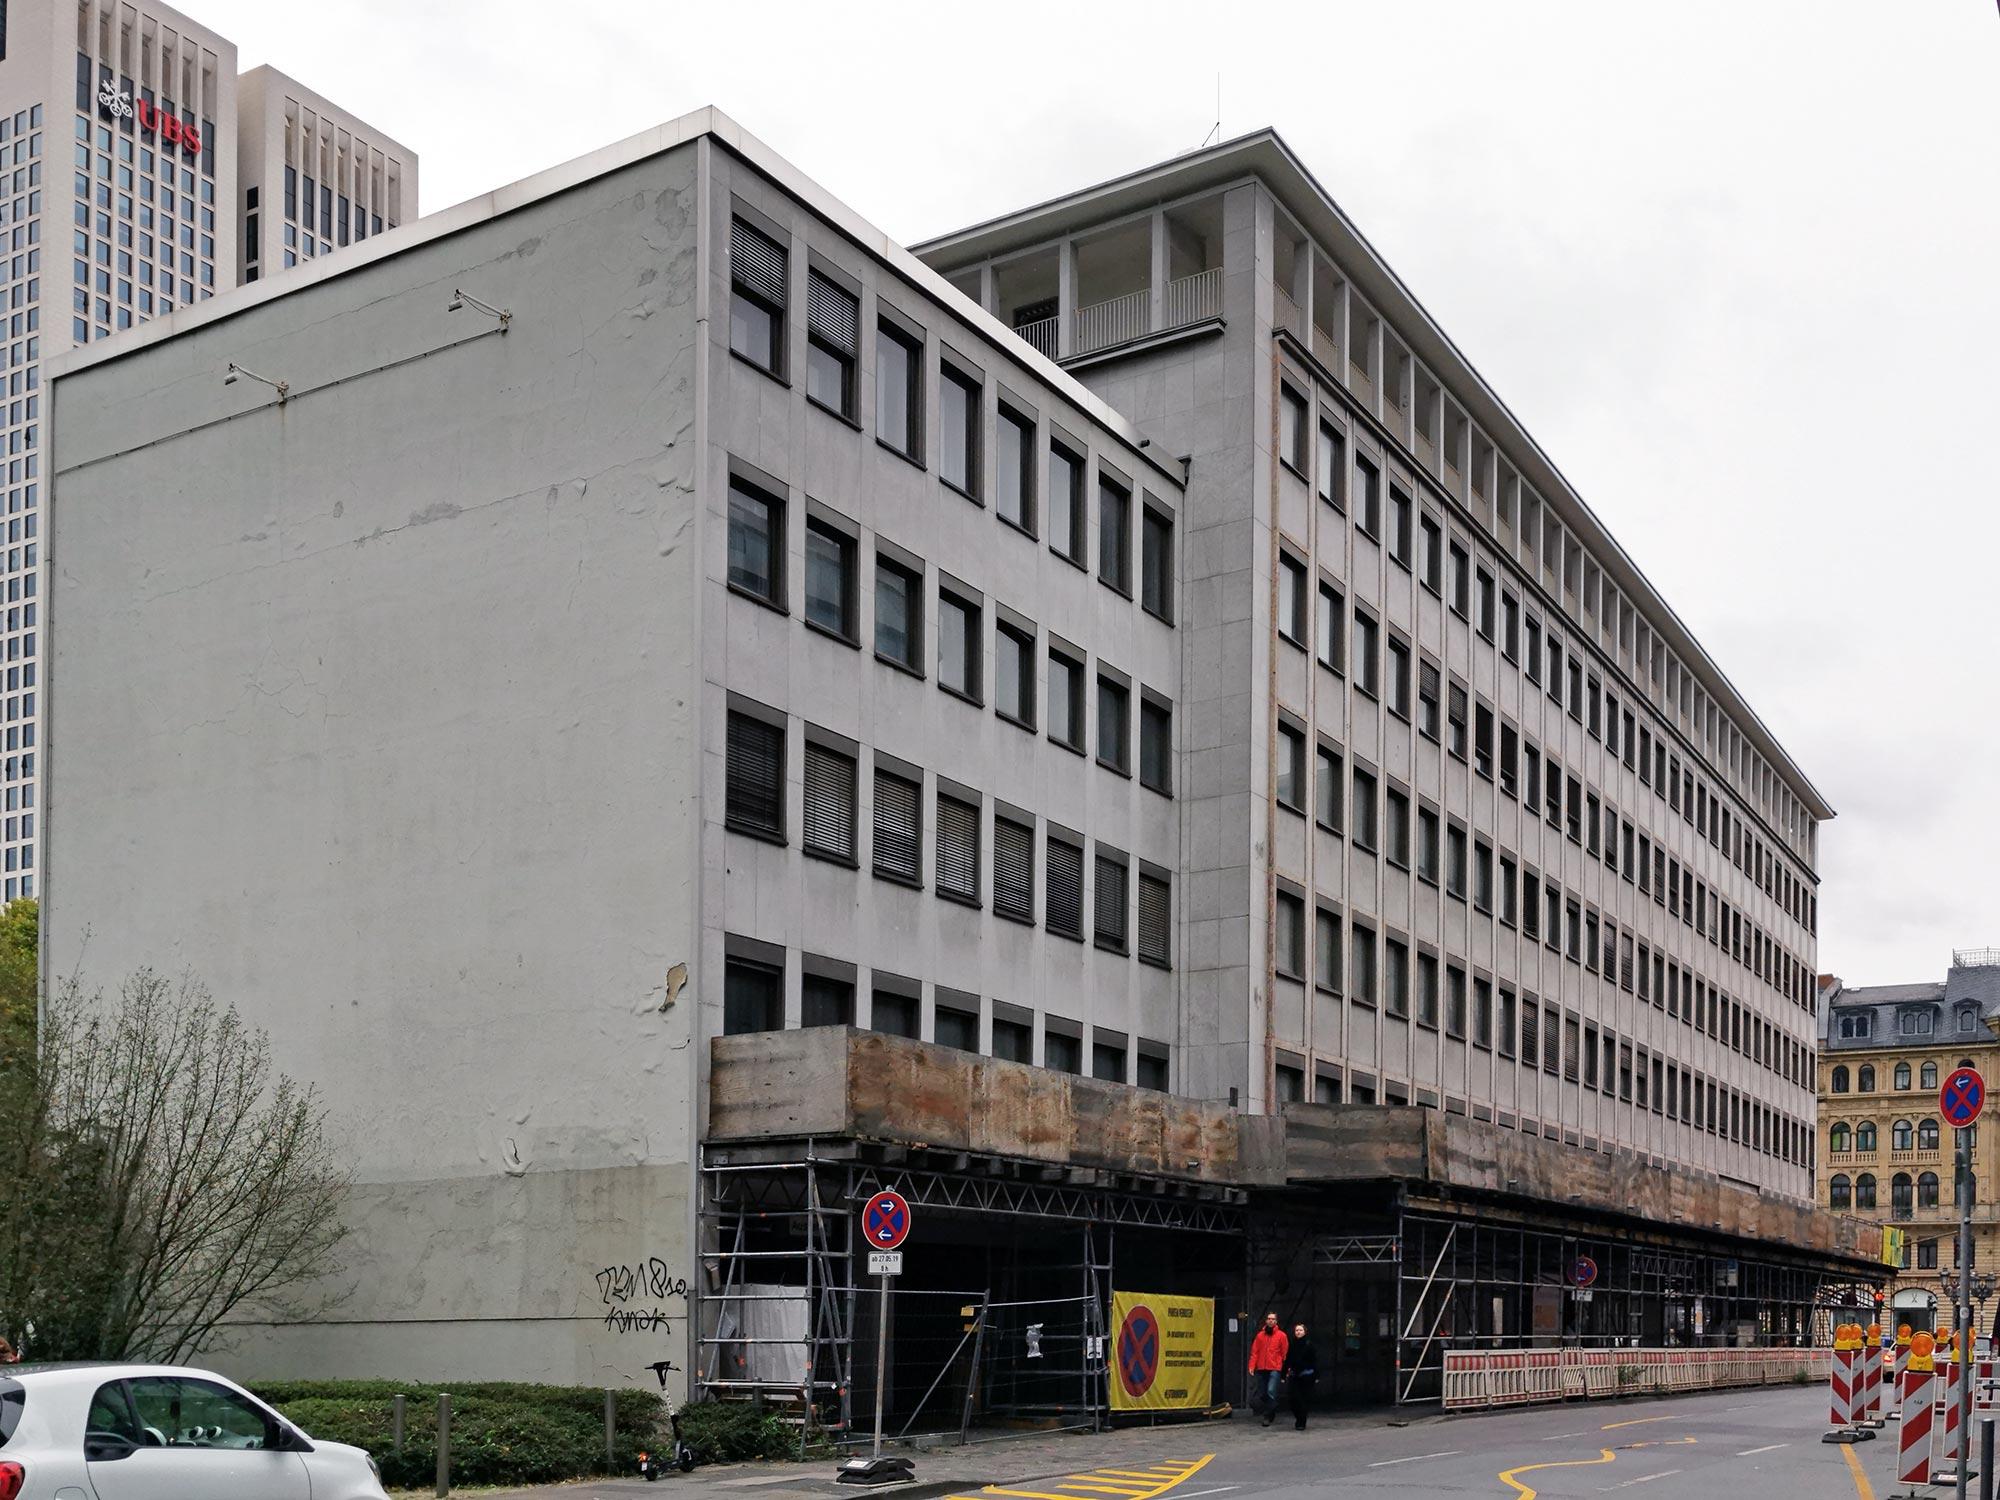 Opernplatz 2 in Frankfurt am Main - RFR Holding GmbH und SIGNA Prime Selection AG - Prime Portfolio Allianz